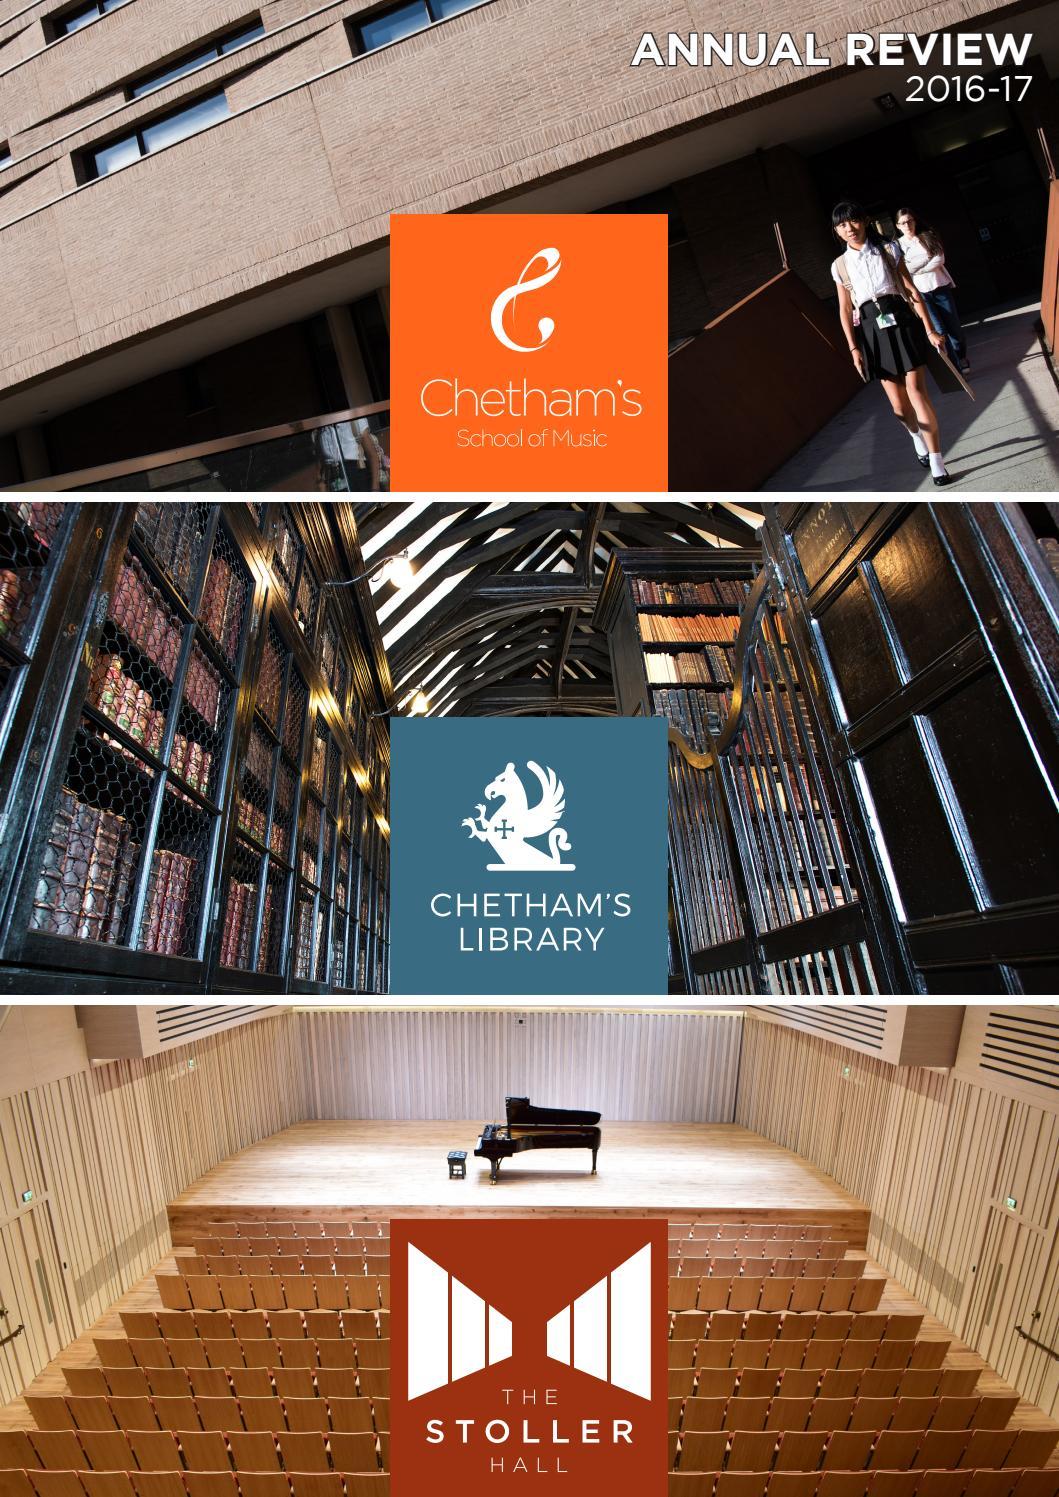 Chetham's School of Music, Chetham's Library & The Stoller